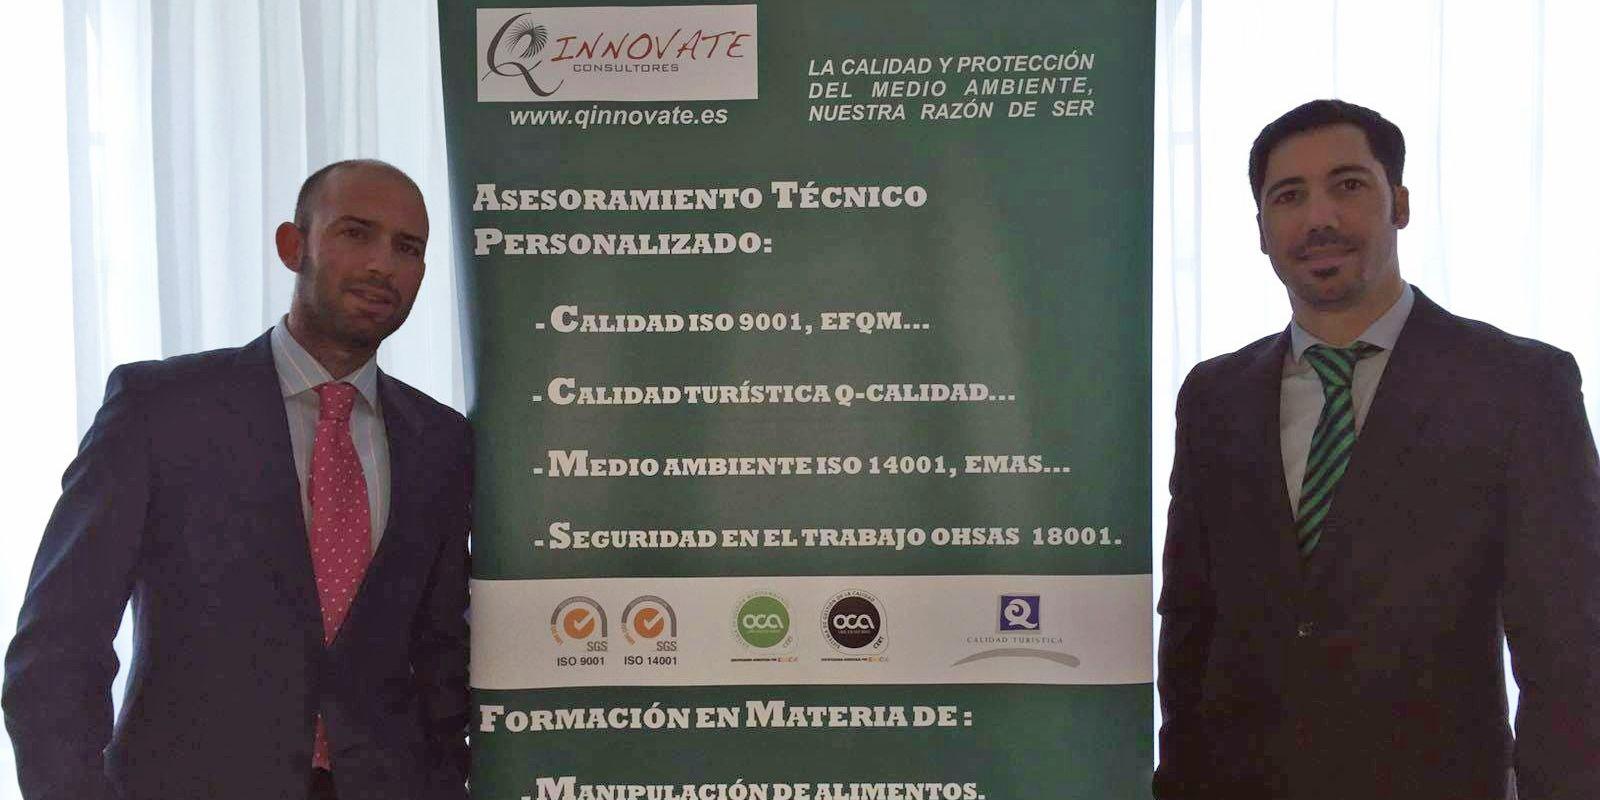 Andrés Ramirez Jimenez, consultor técnico, junto a Adrián Macías, gerente de Q-innovate